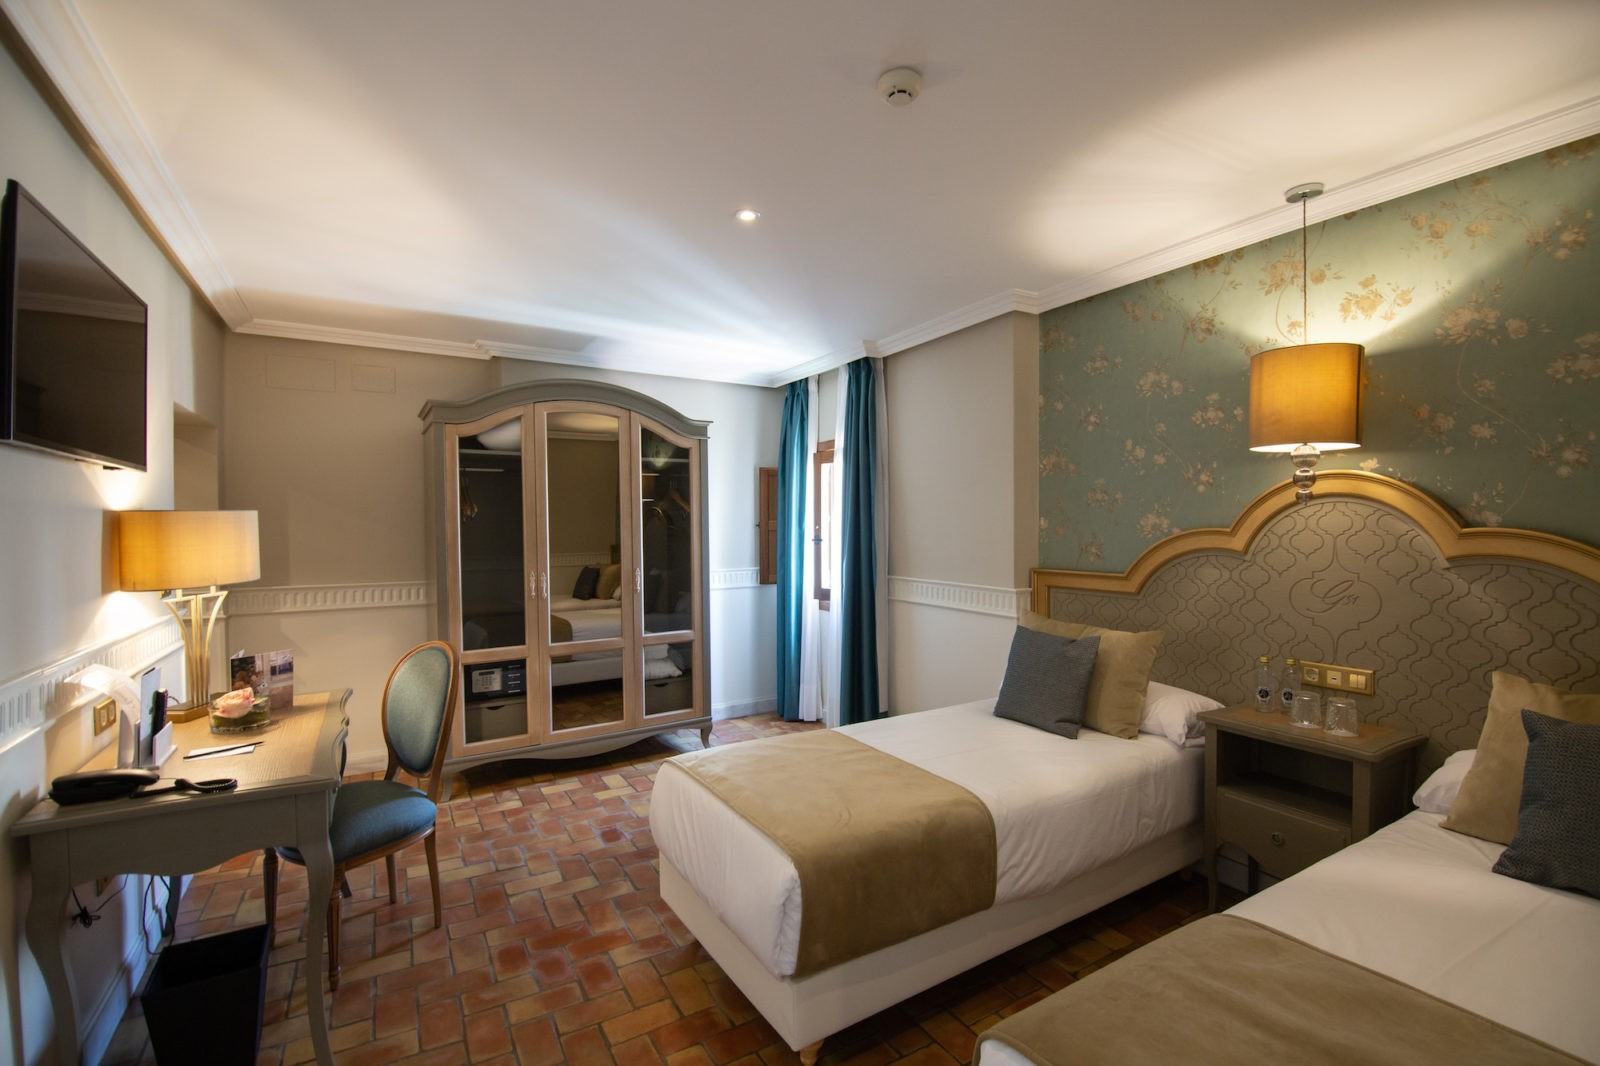 apartamento-hotel-gravina-51-sevilla-habitacion-doble